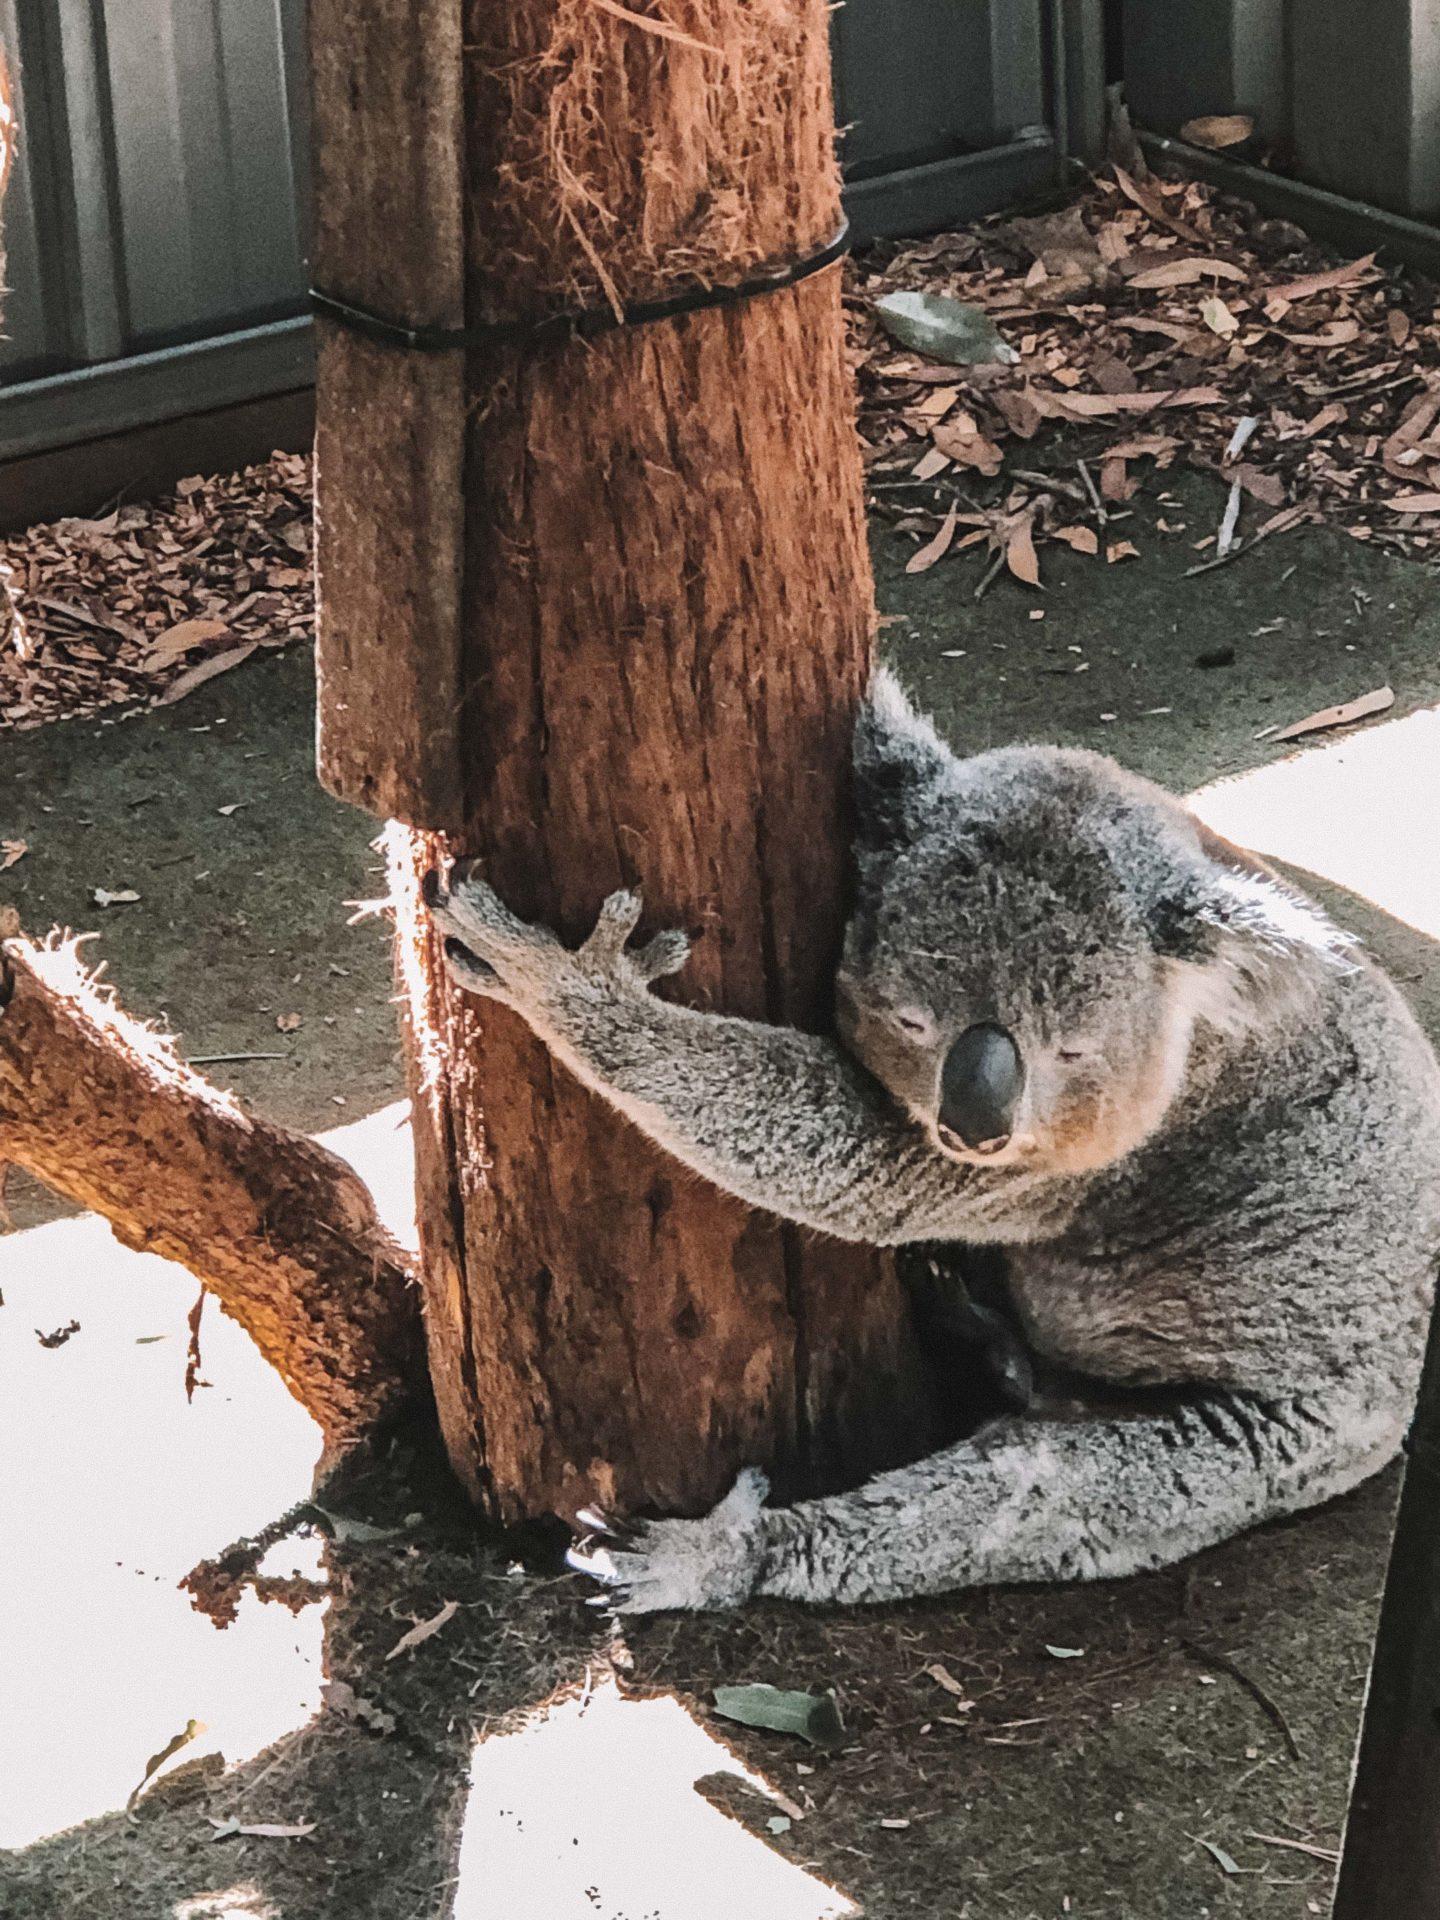 Port Macquarie Koalas Hospital Phare Byron Bay - Blondie Baby blog mode et voyages